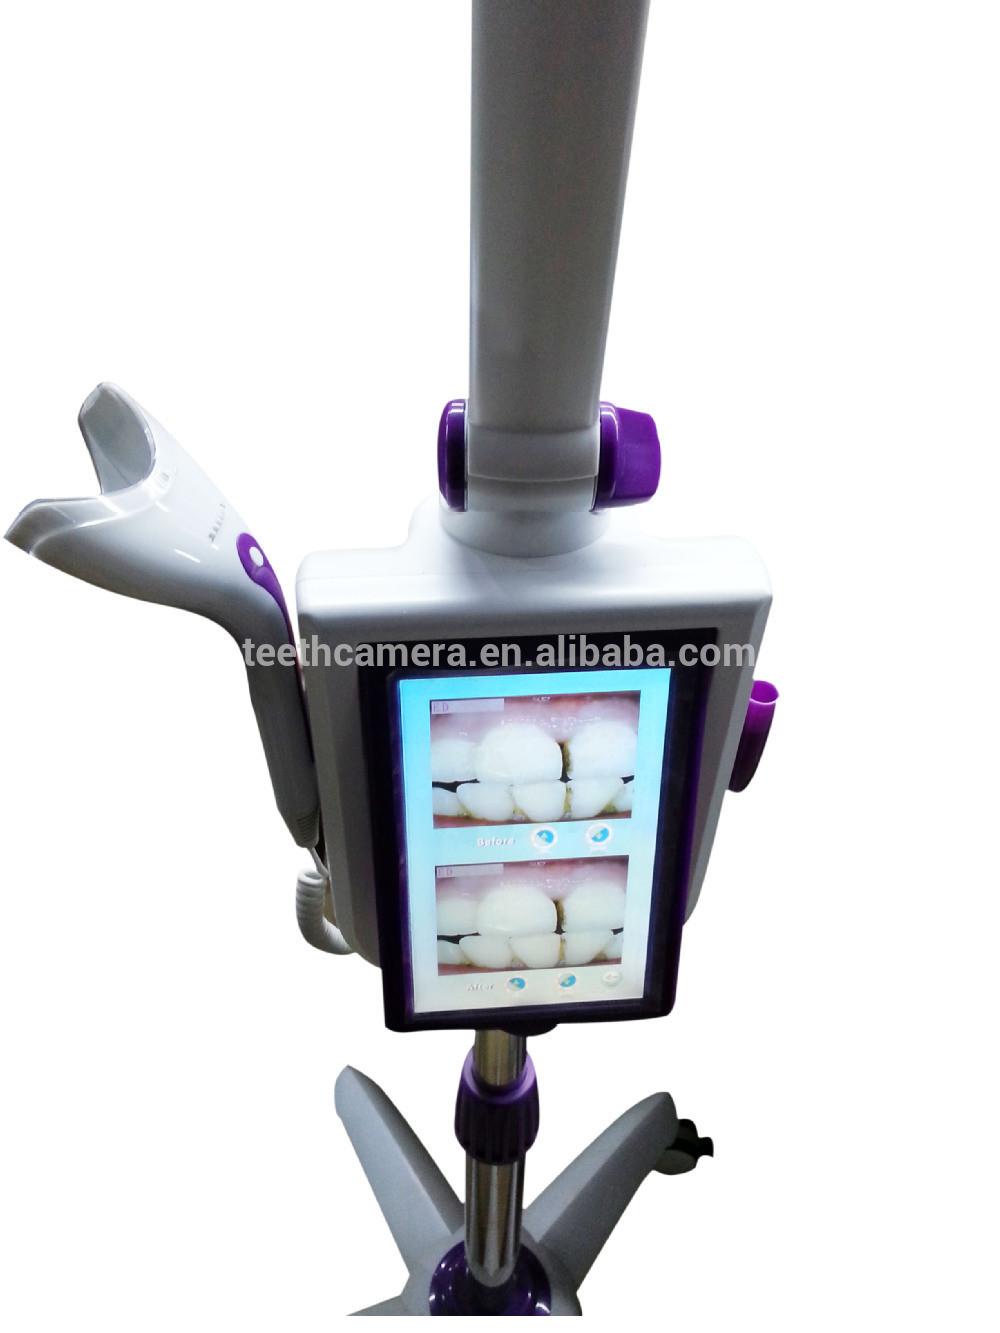 Md887b Colorful Teeth Bleaching System with Digital Camera